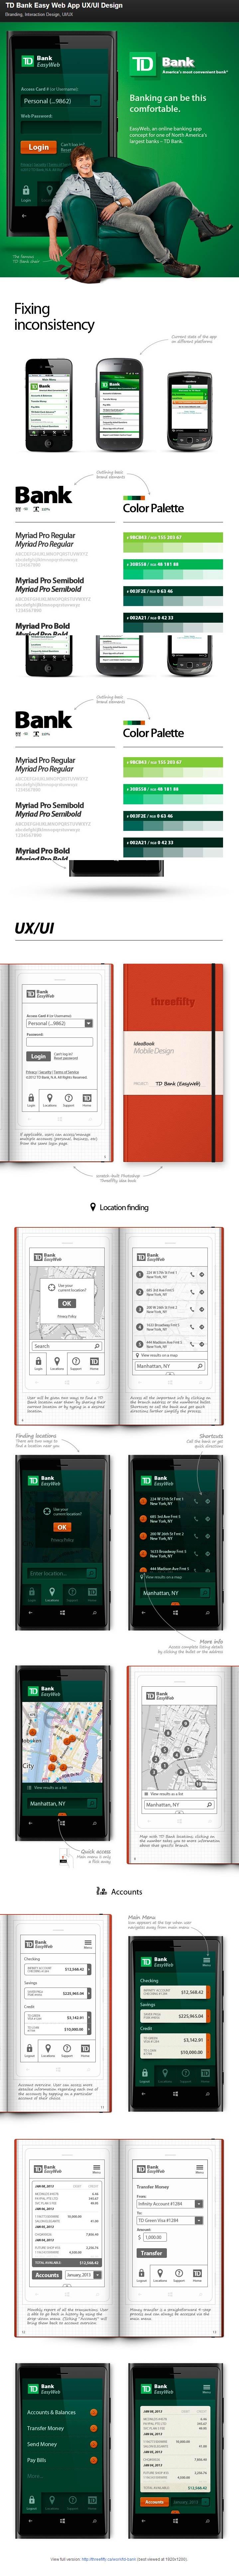 TD Bank Easy Web #App #UX #UI Design